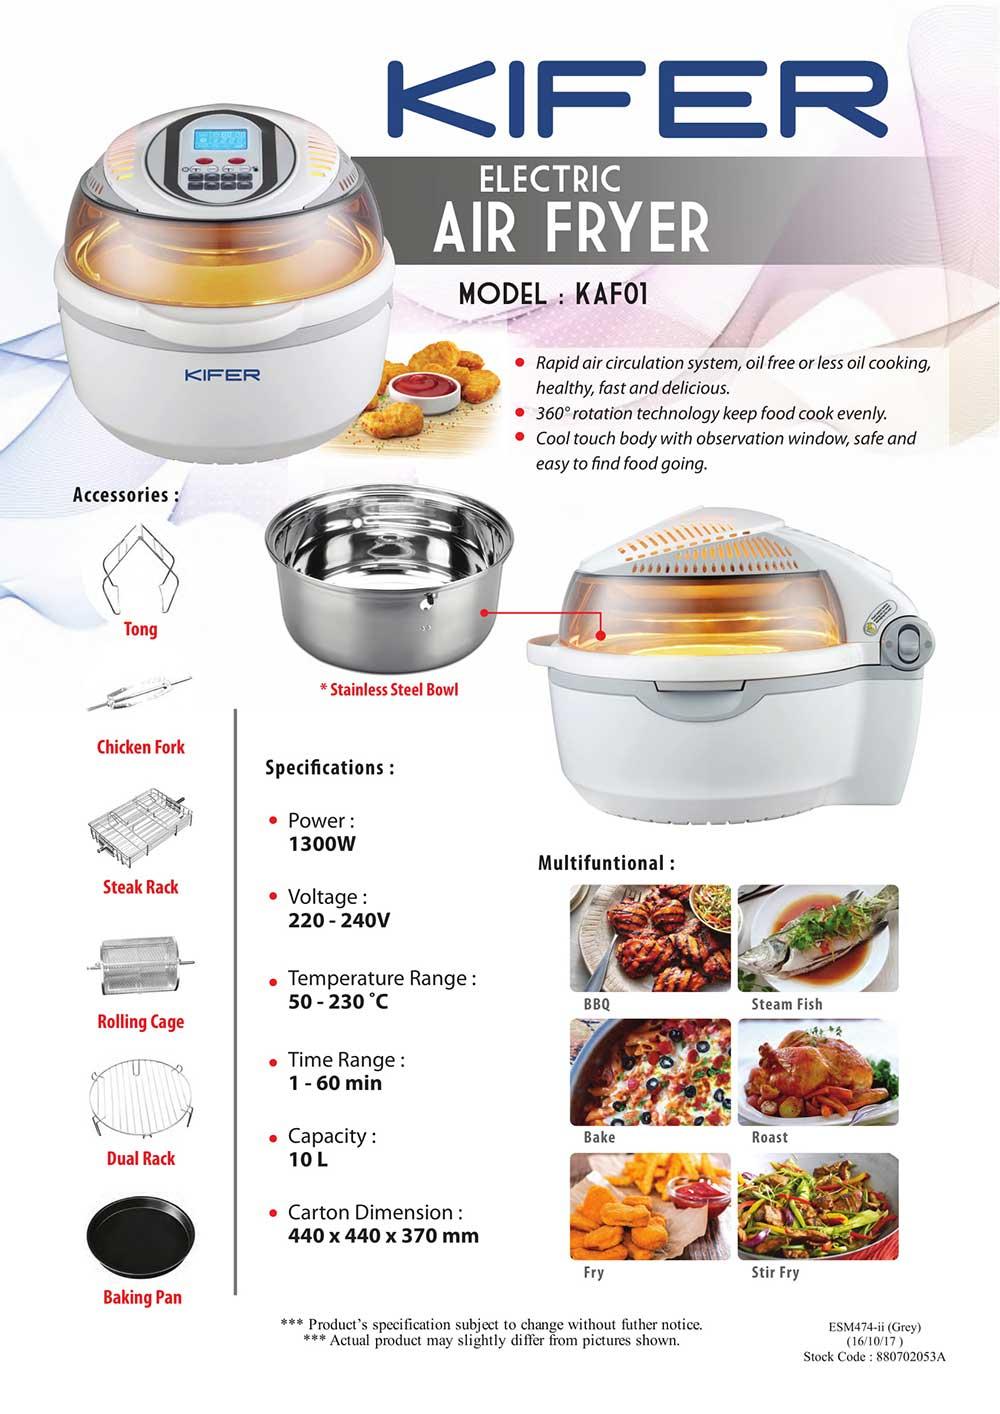 Hasil carian imej untuk Kifer air fryer